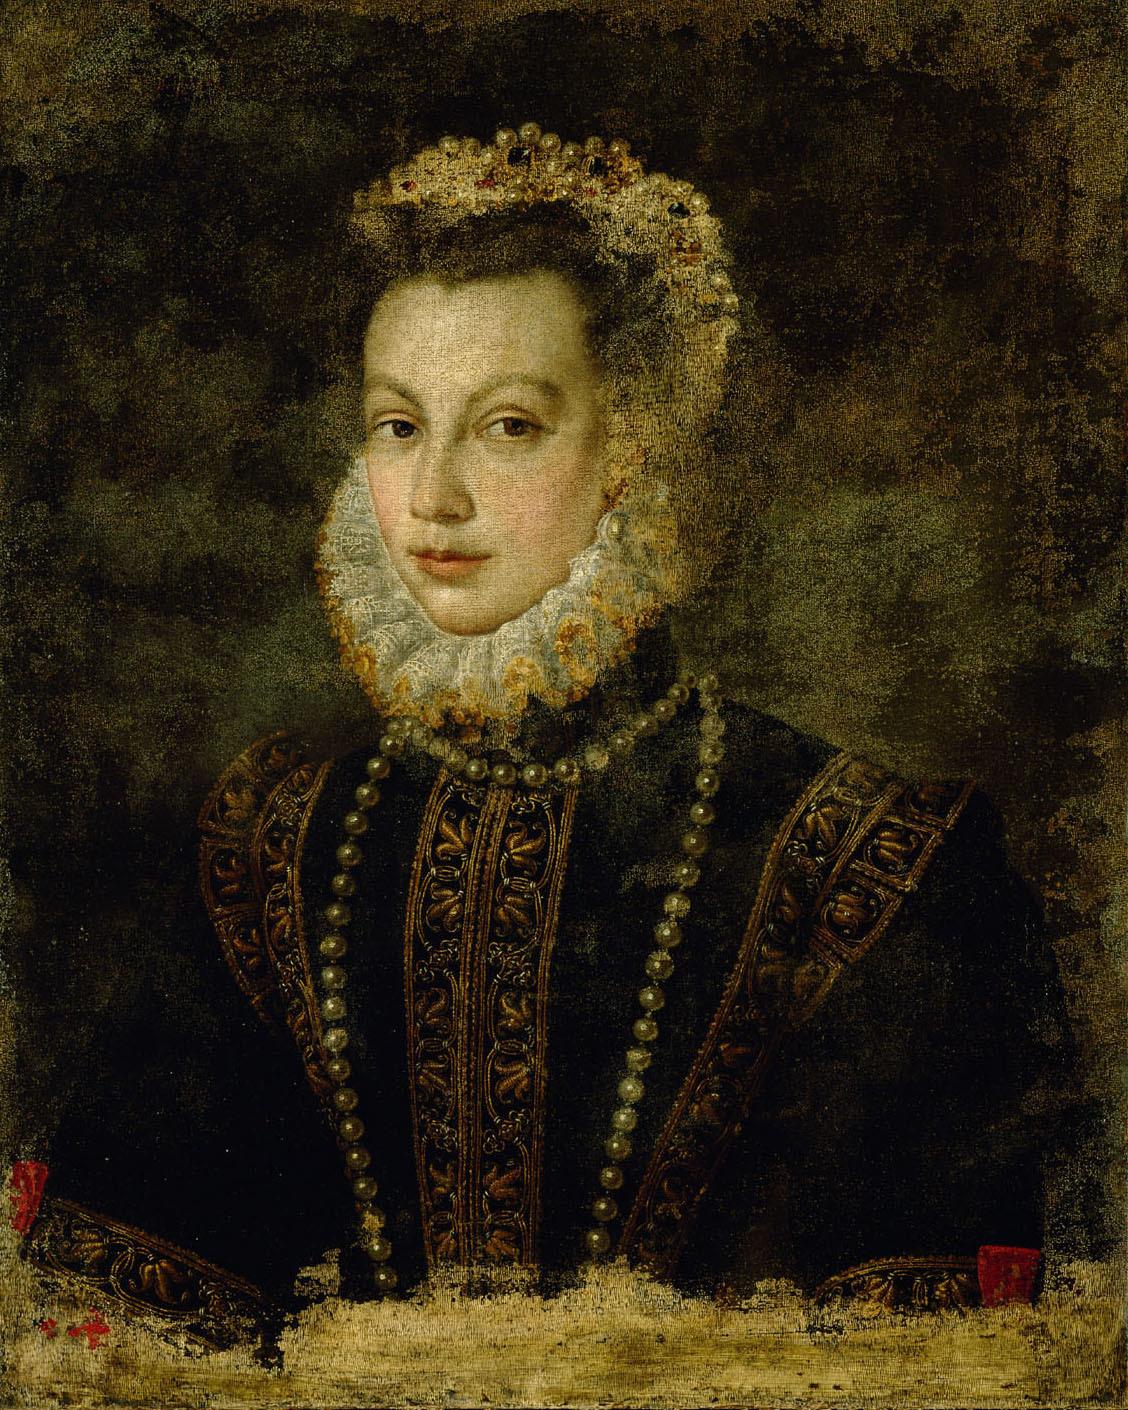 Pittura Arte al Femminile... Isabel_von_Valois_by_Sofonisba_Anguissola